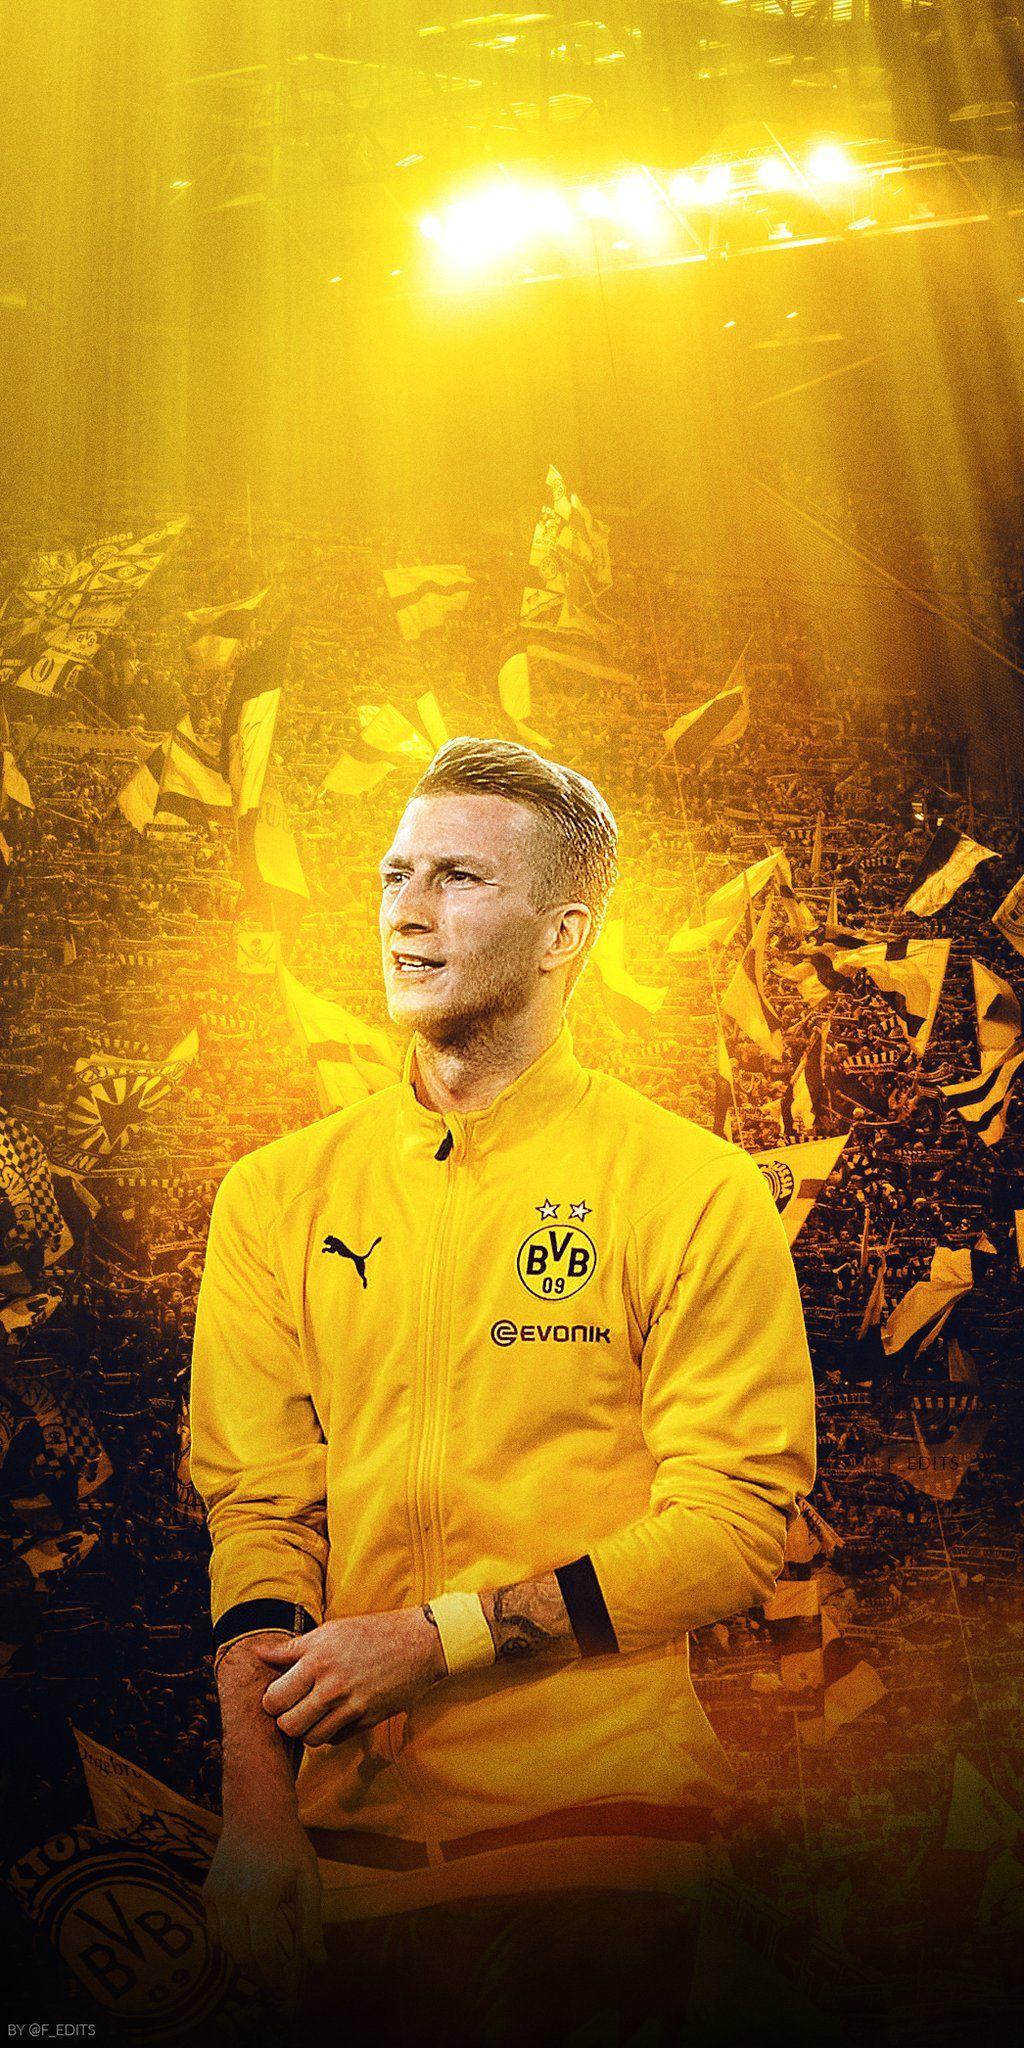 Borussia Dortmund On Twitter Hot Football Fans Football Wallpaper Soccer Players